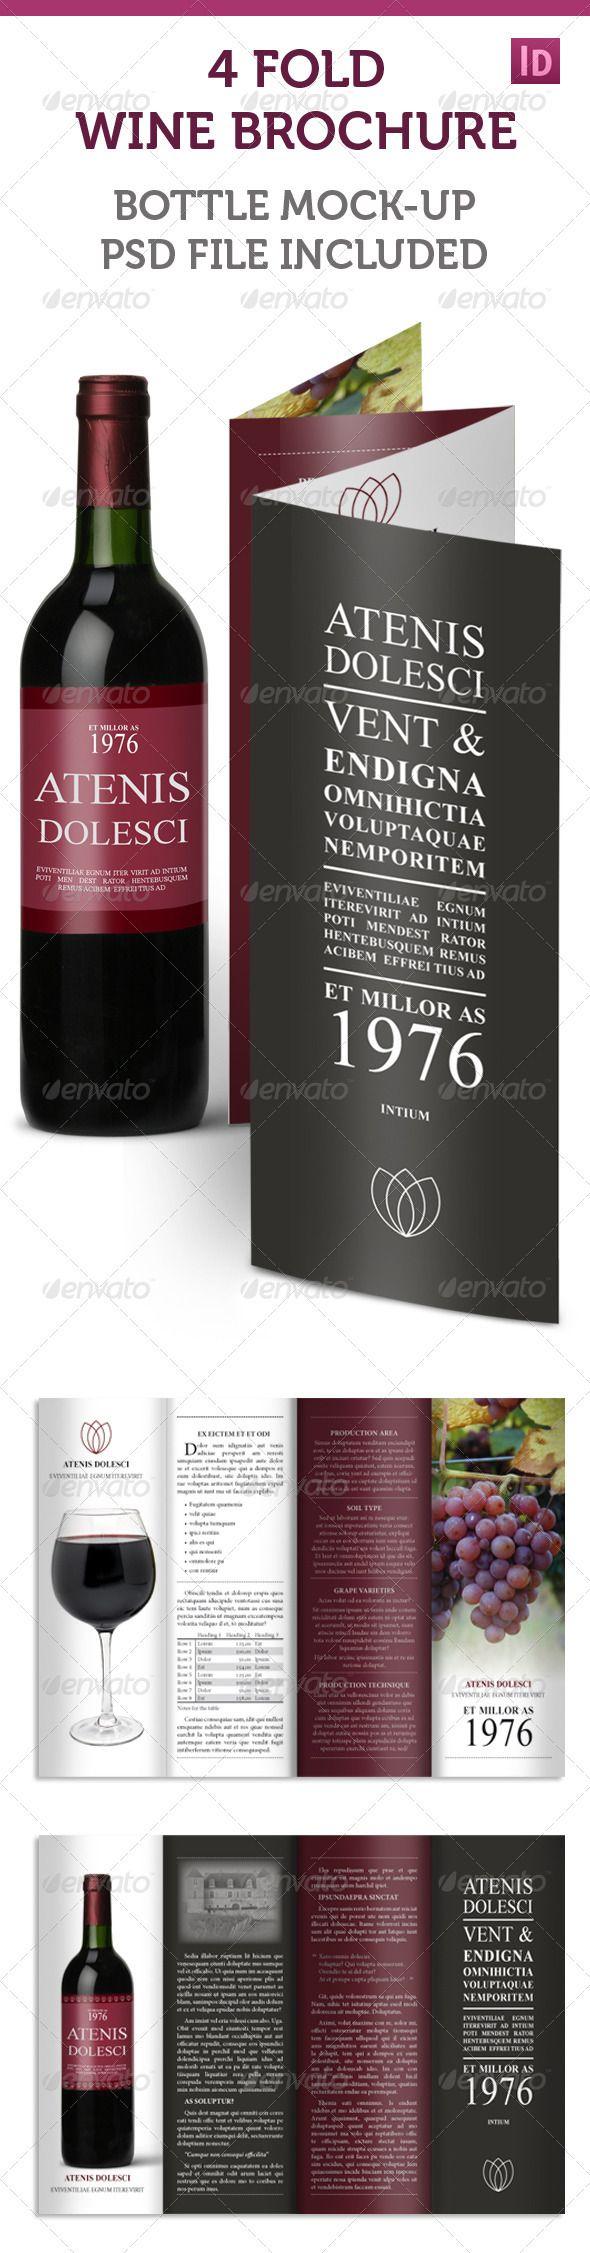 4 fold accordion wine brochure